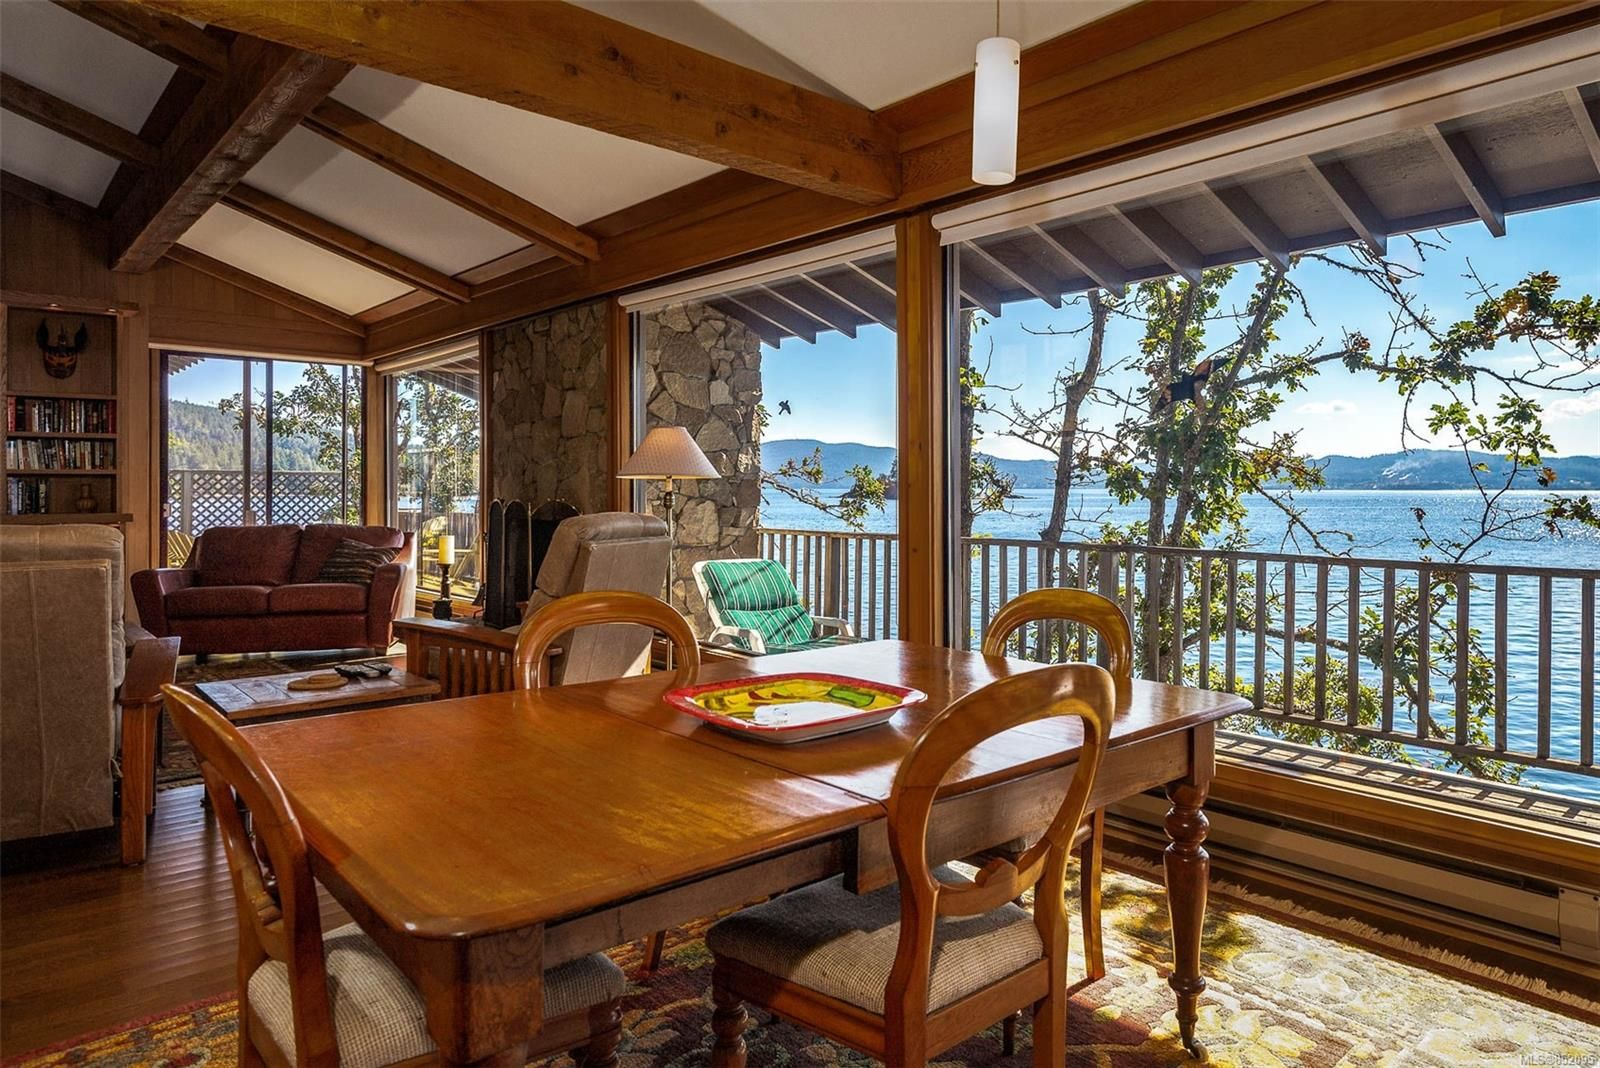 Photo 10: Photos: 236 McGill Rd in : GI Salt Spring House for sale (Gulf Islands)  : MLS®# 852095